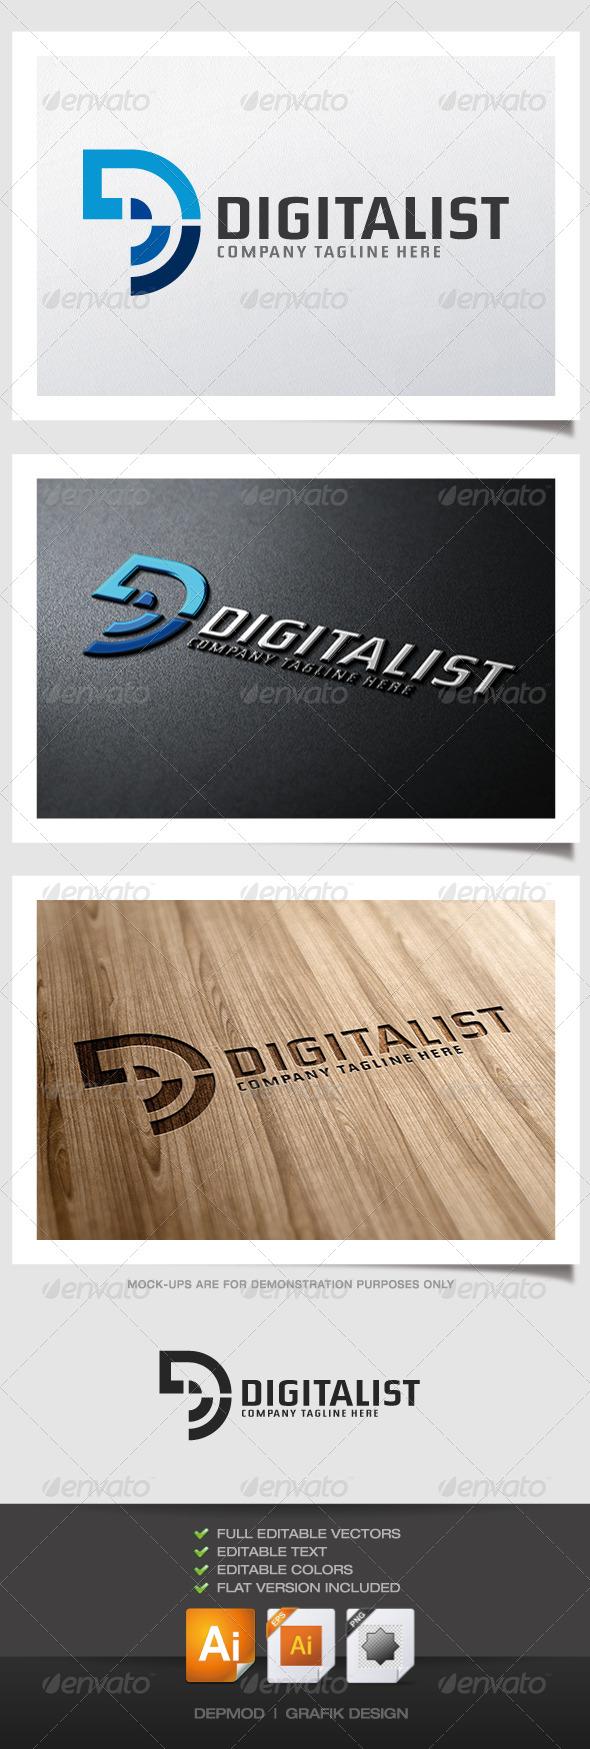 GraphicRiver Digitalist Logo 5060205